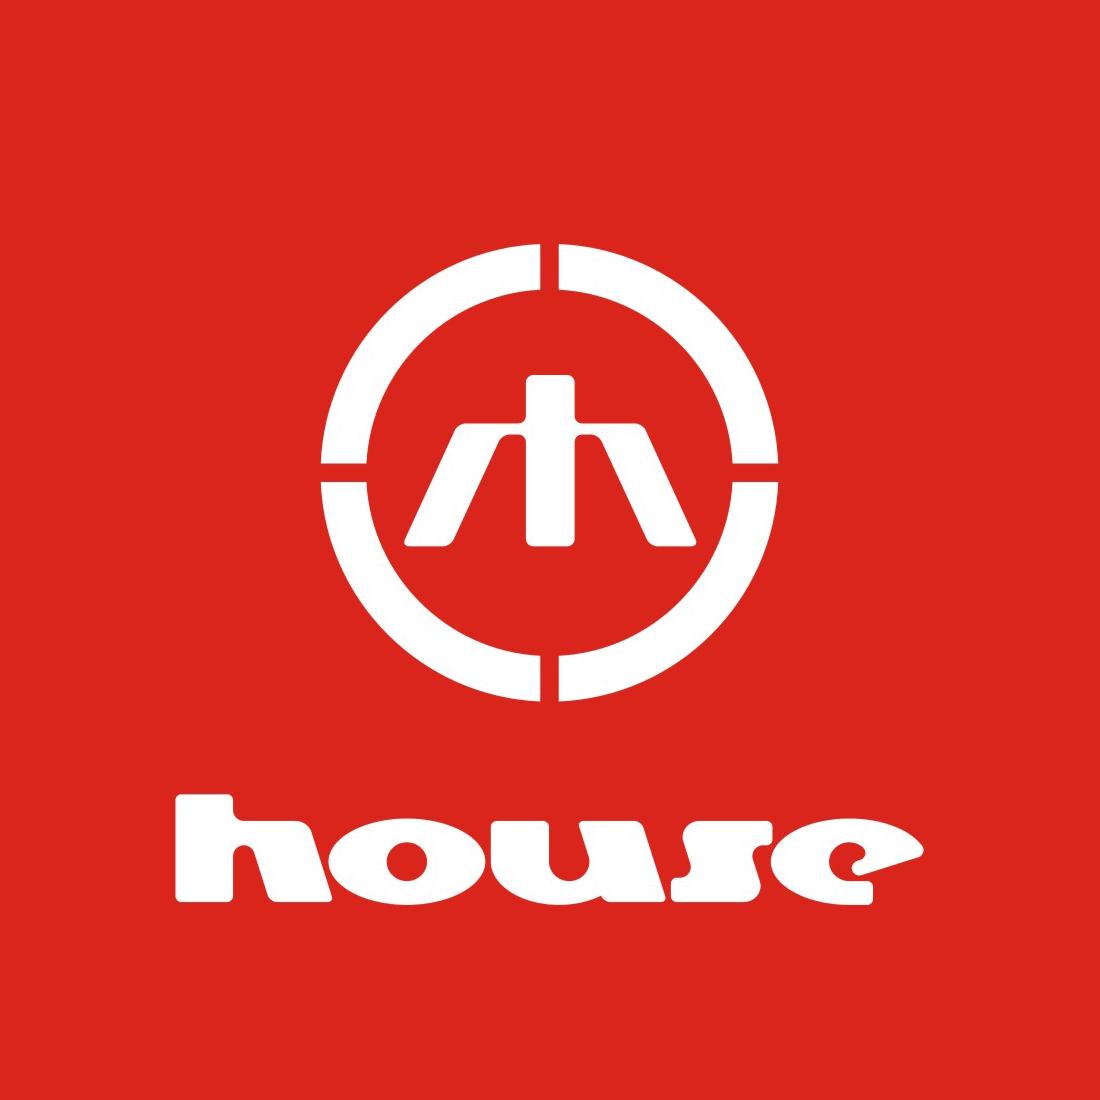 -20% House (Black Friday)